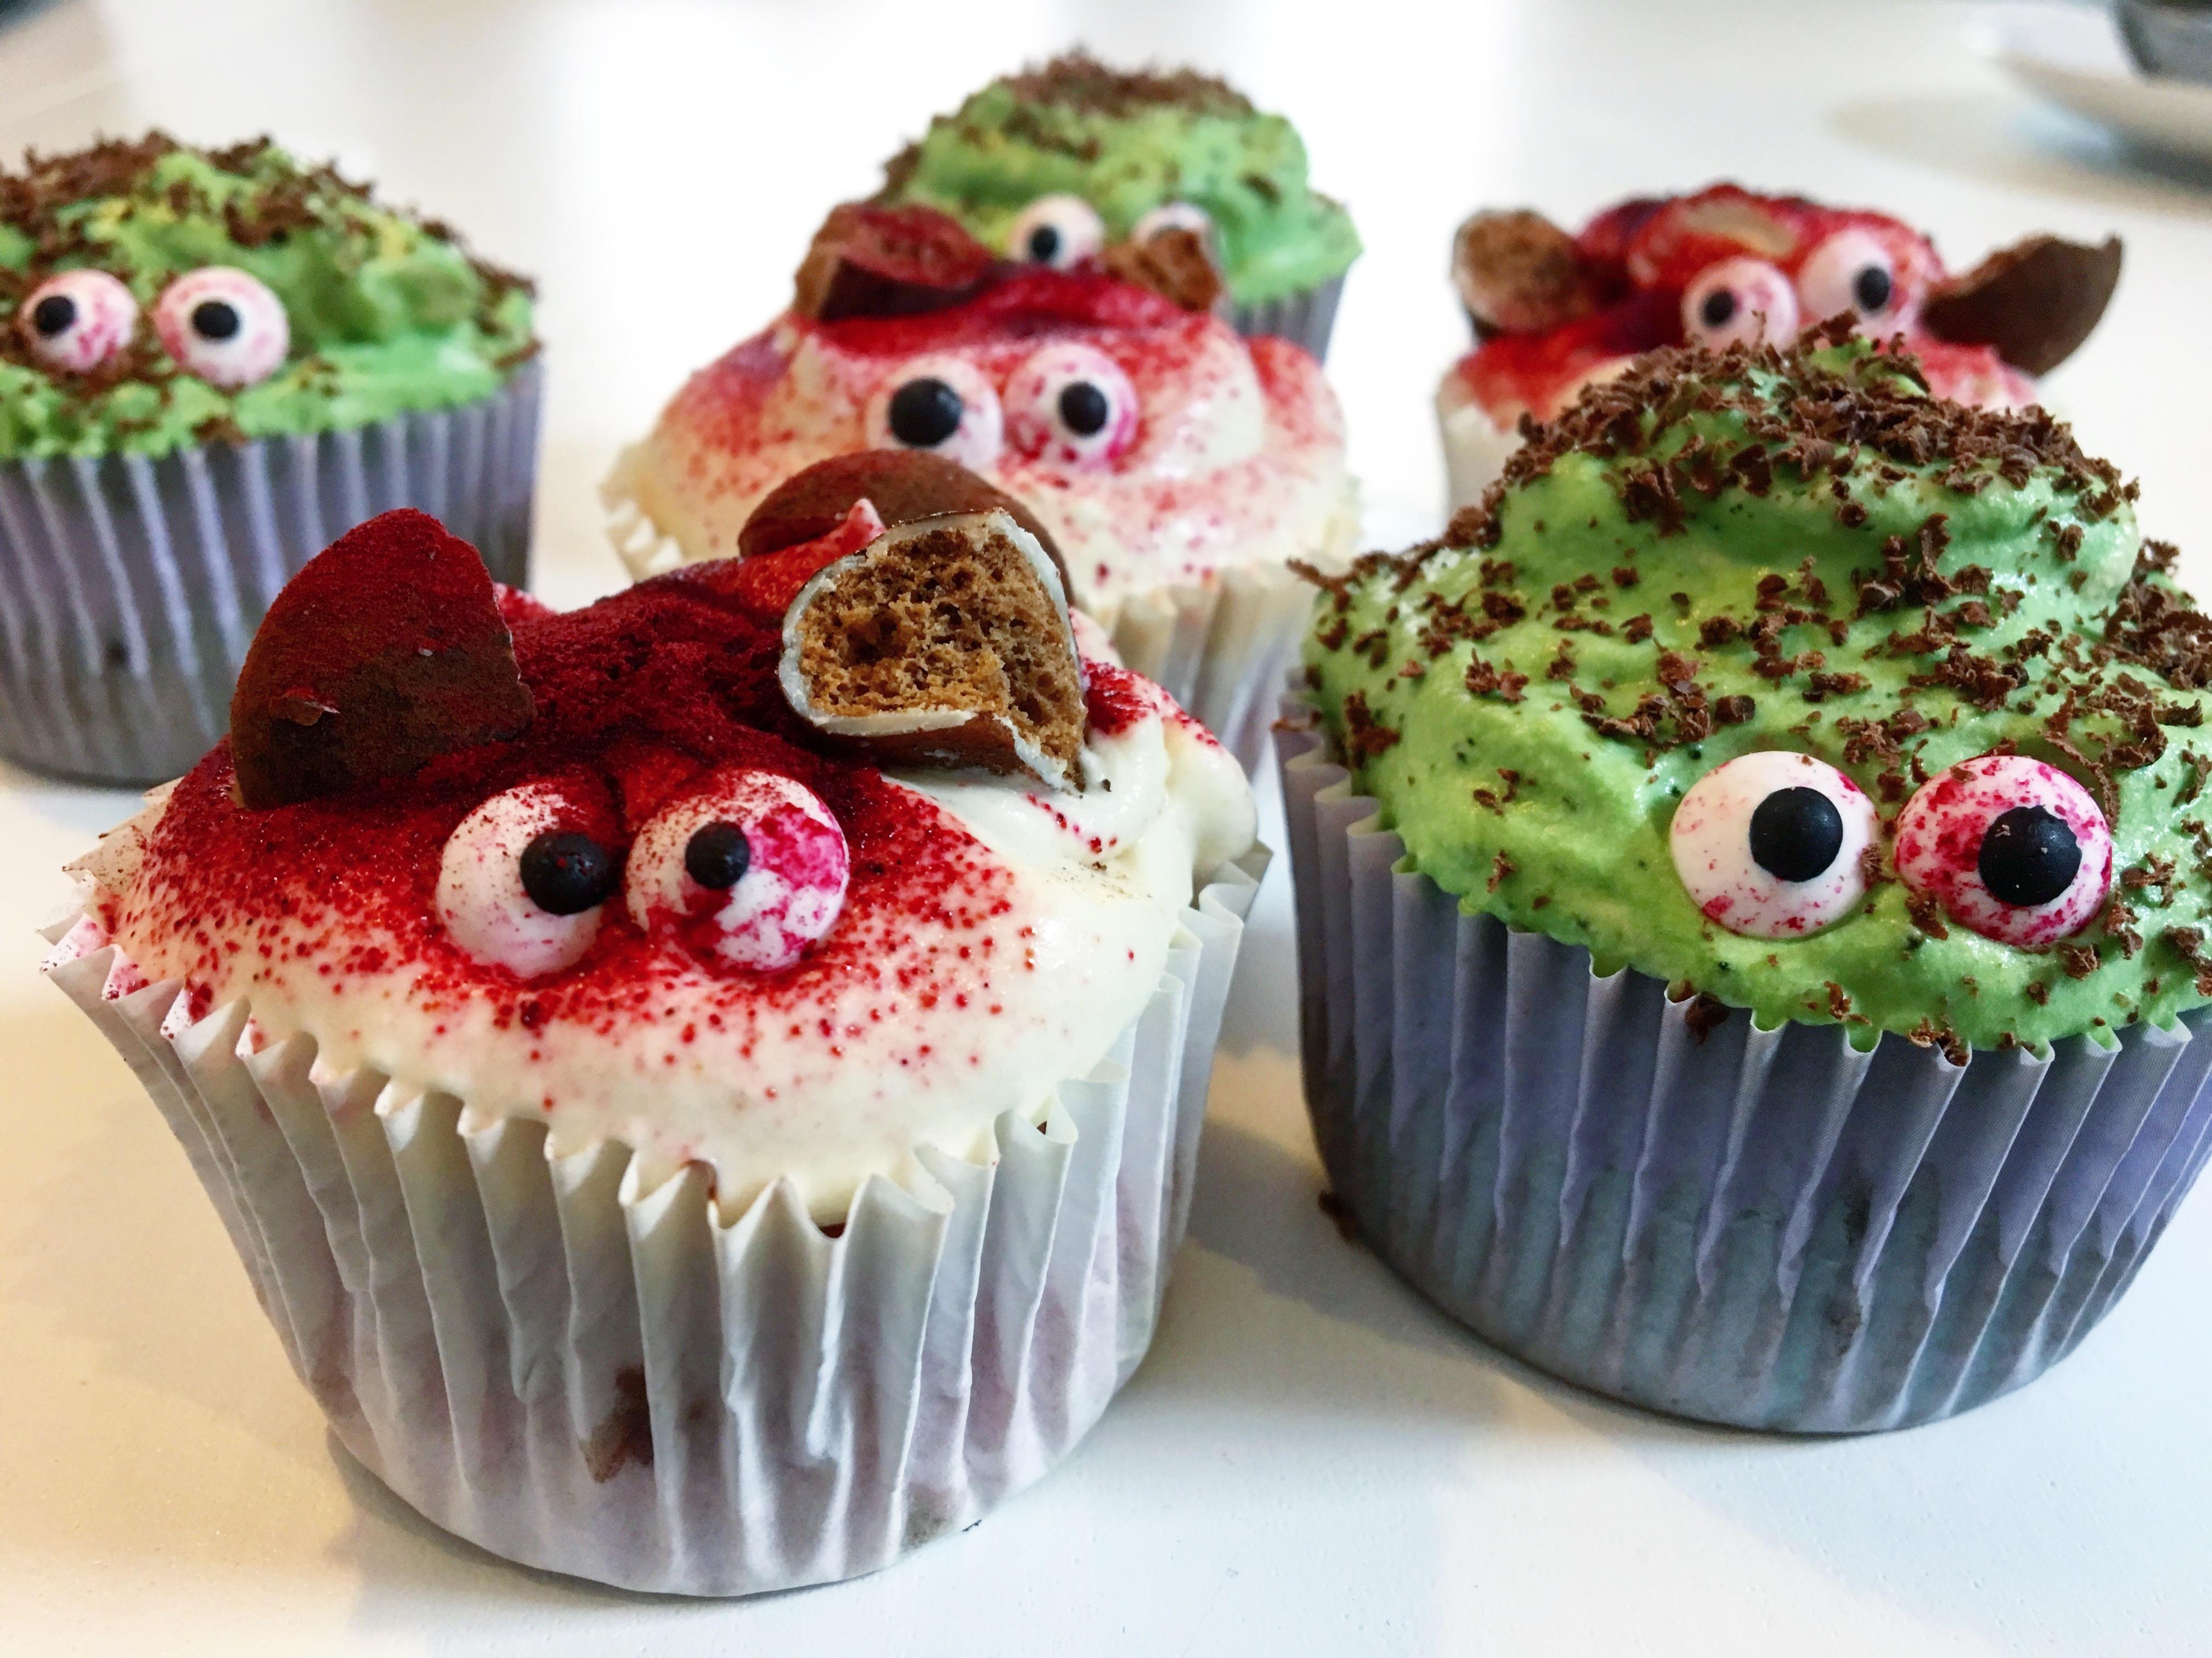 Griezelig schattige cupcakes